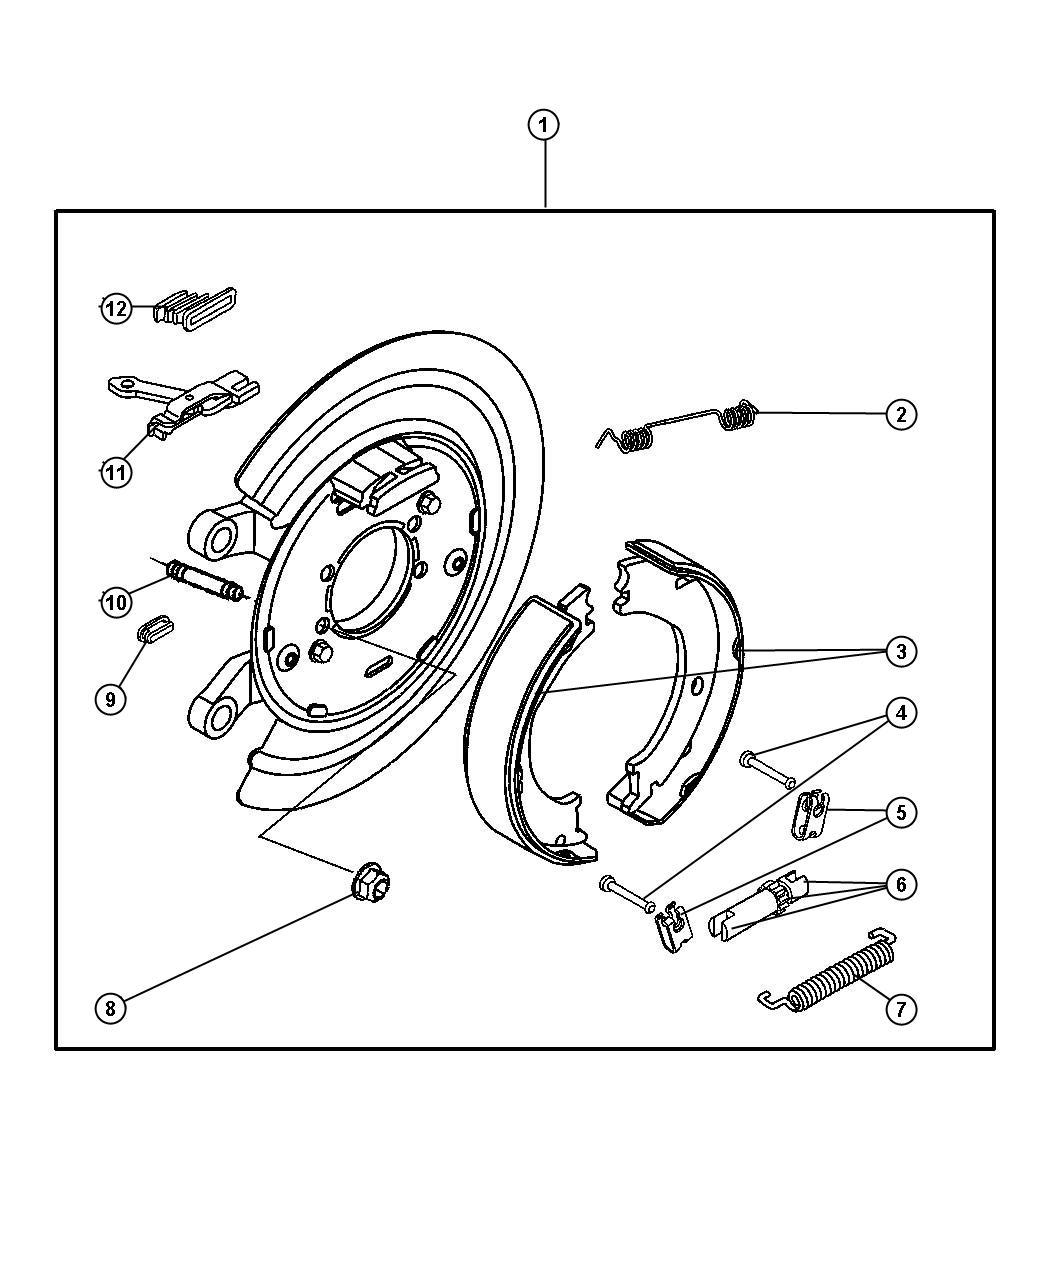 2003 Dodge Ram 2500 Adapter  Adapter Assembly  Parking